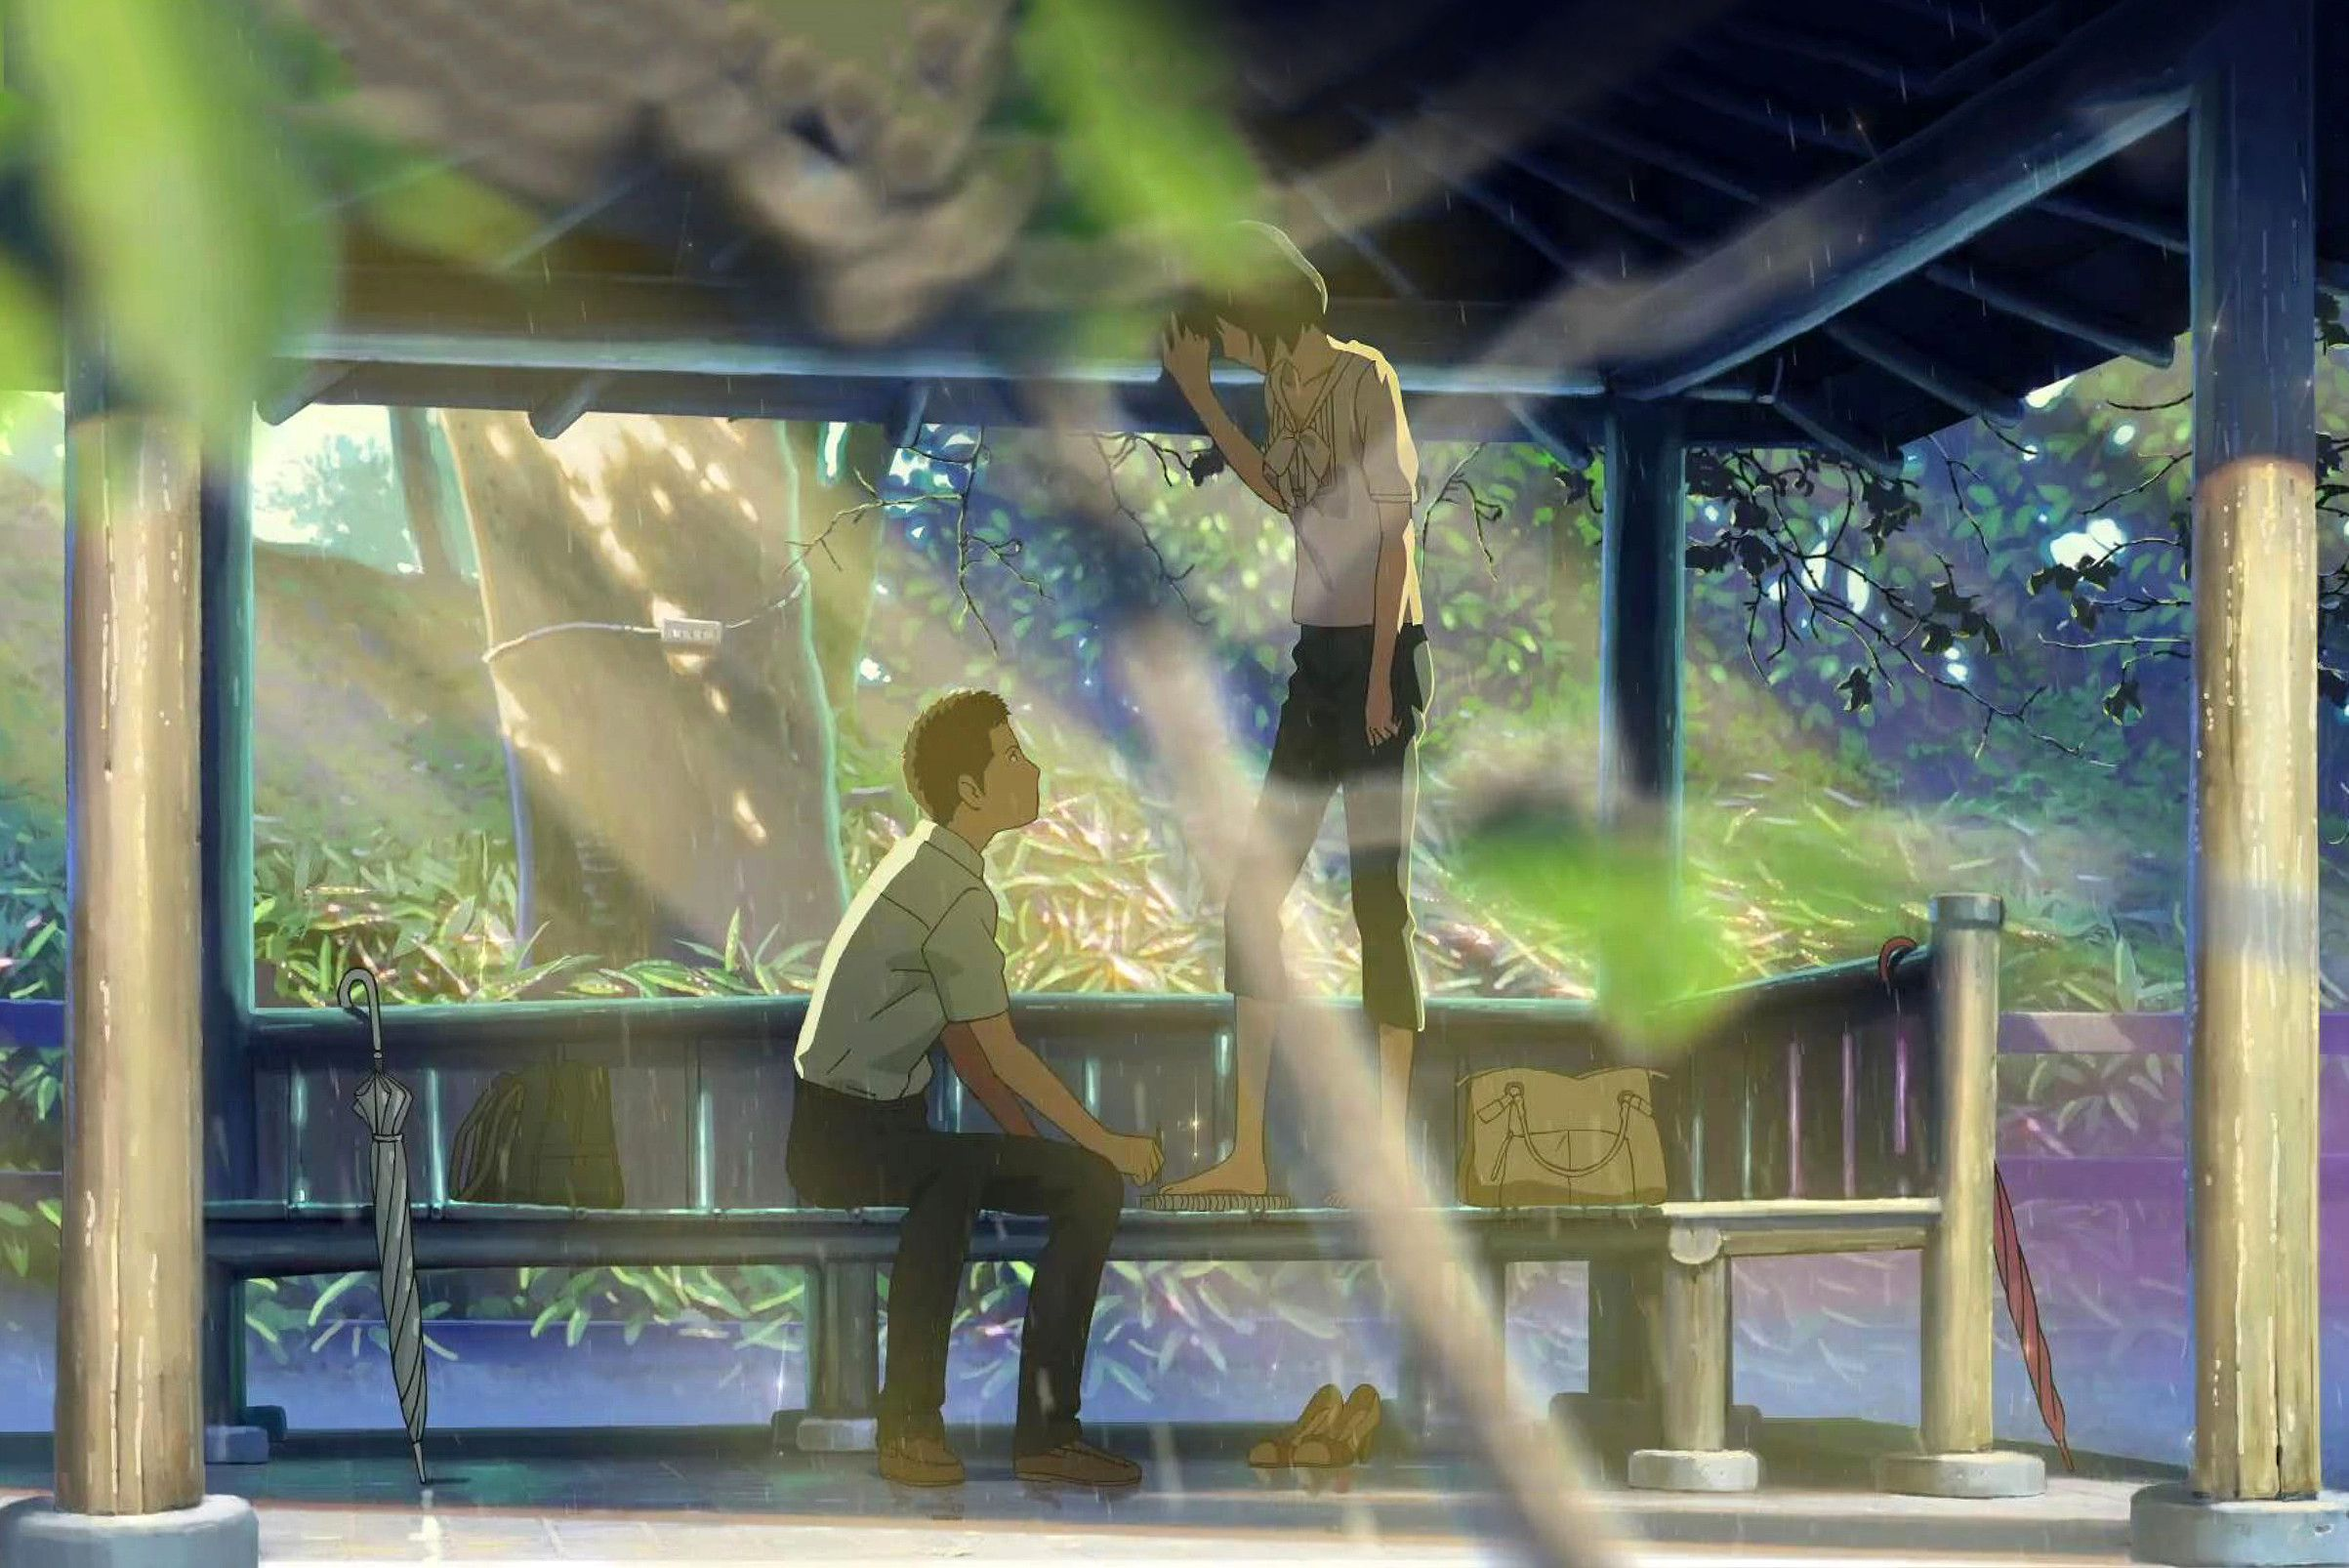 10 Anime Films You Should Watch If You Like Studio Ghibli